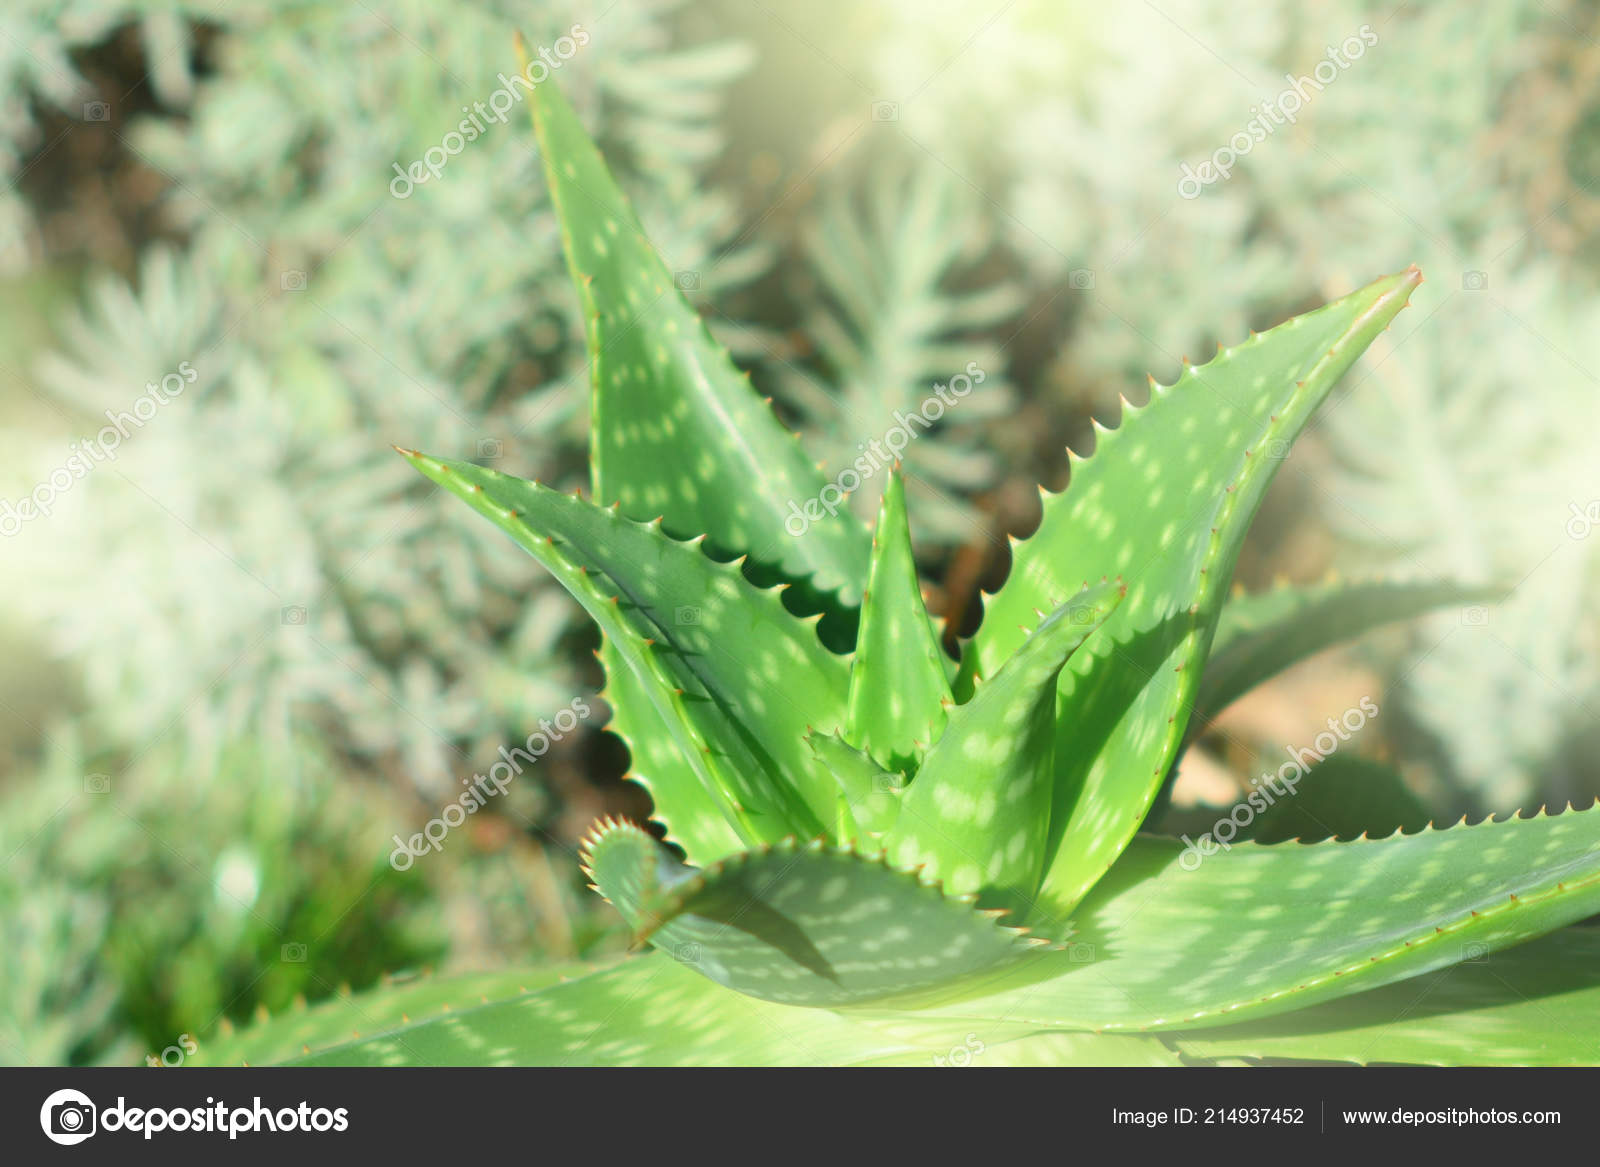 Aloe Vera Plant Natural Healthy Ingredient Stock Photo C Charmoment 214937452